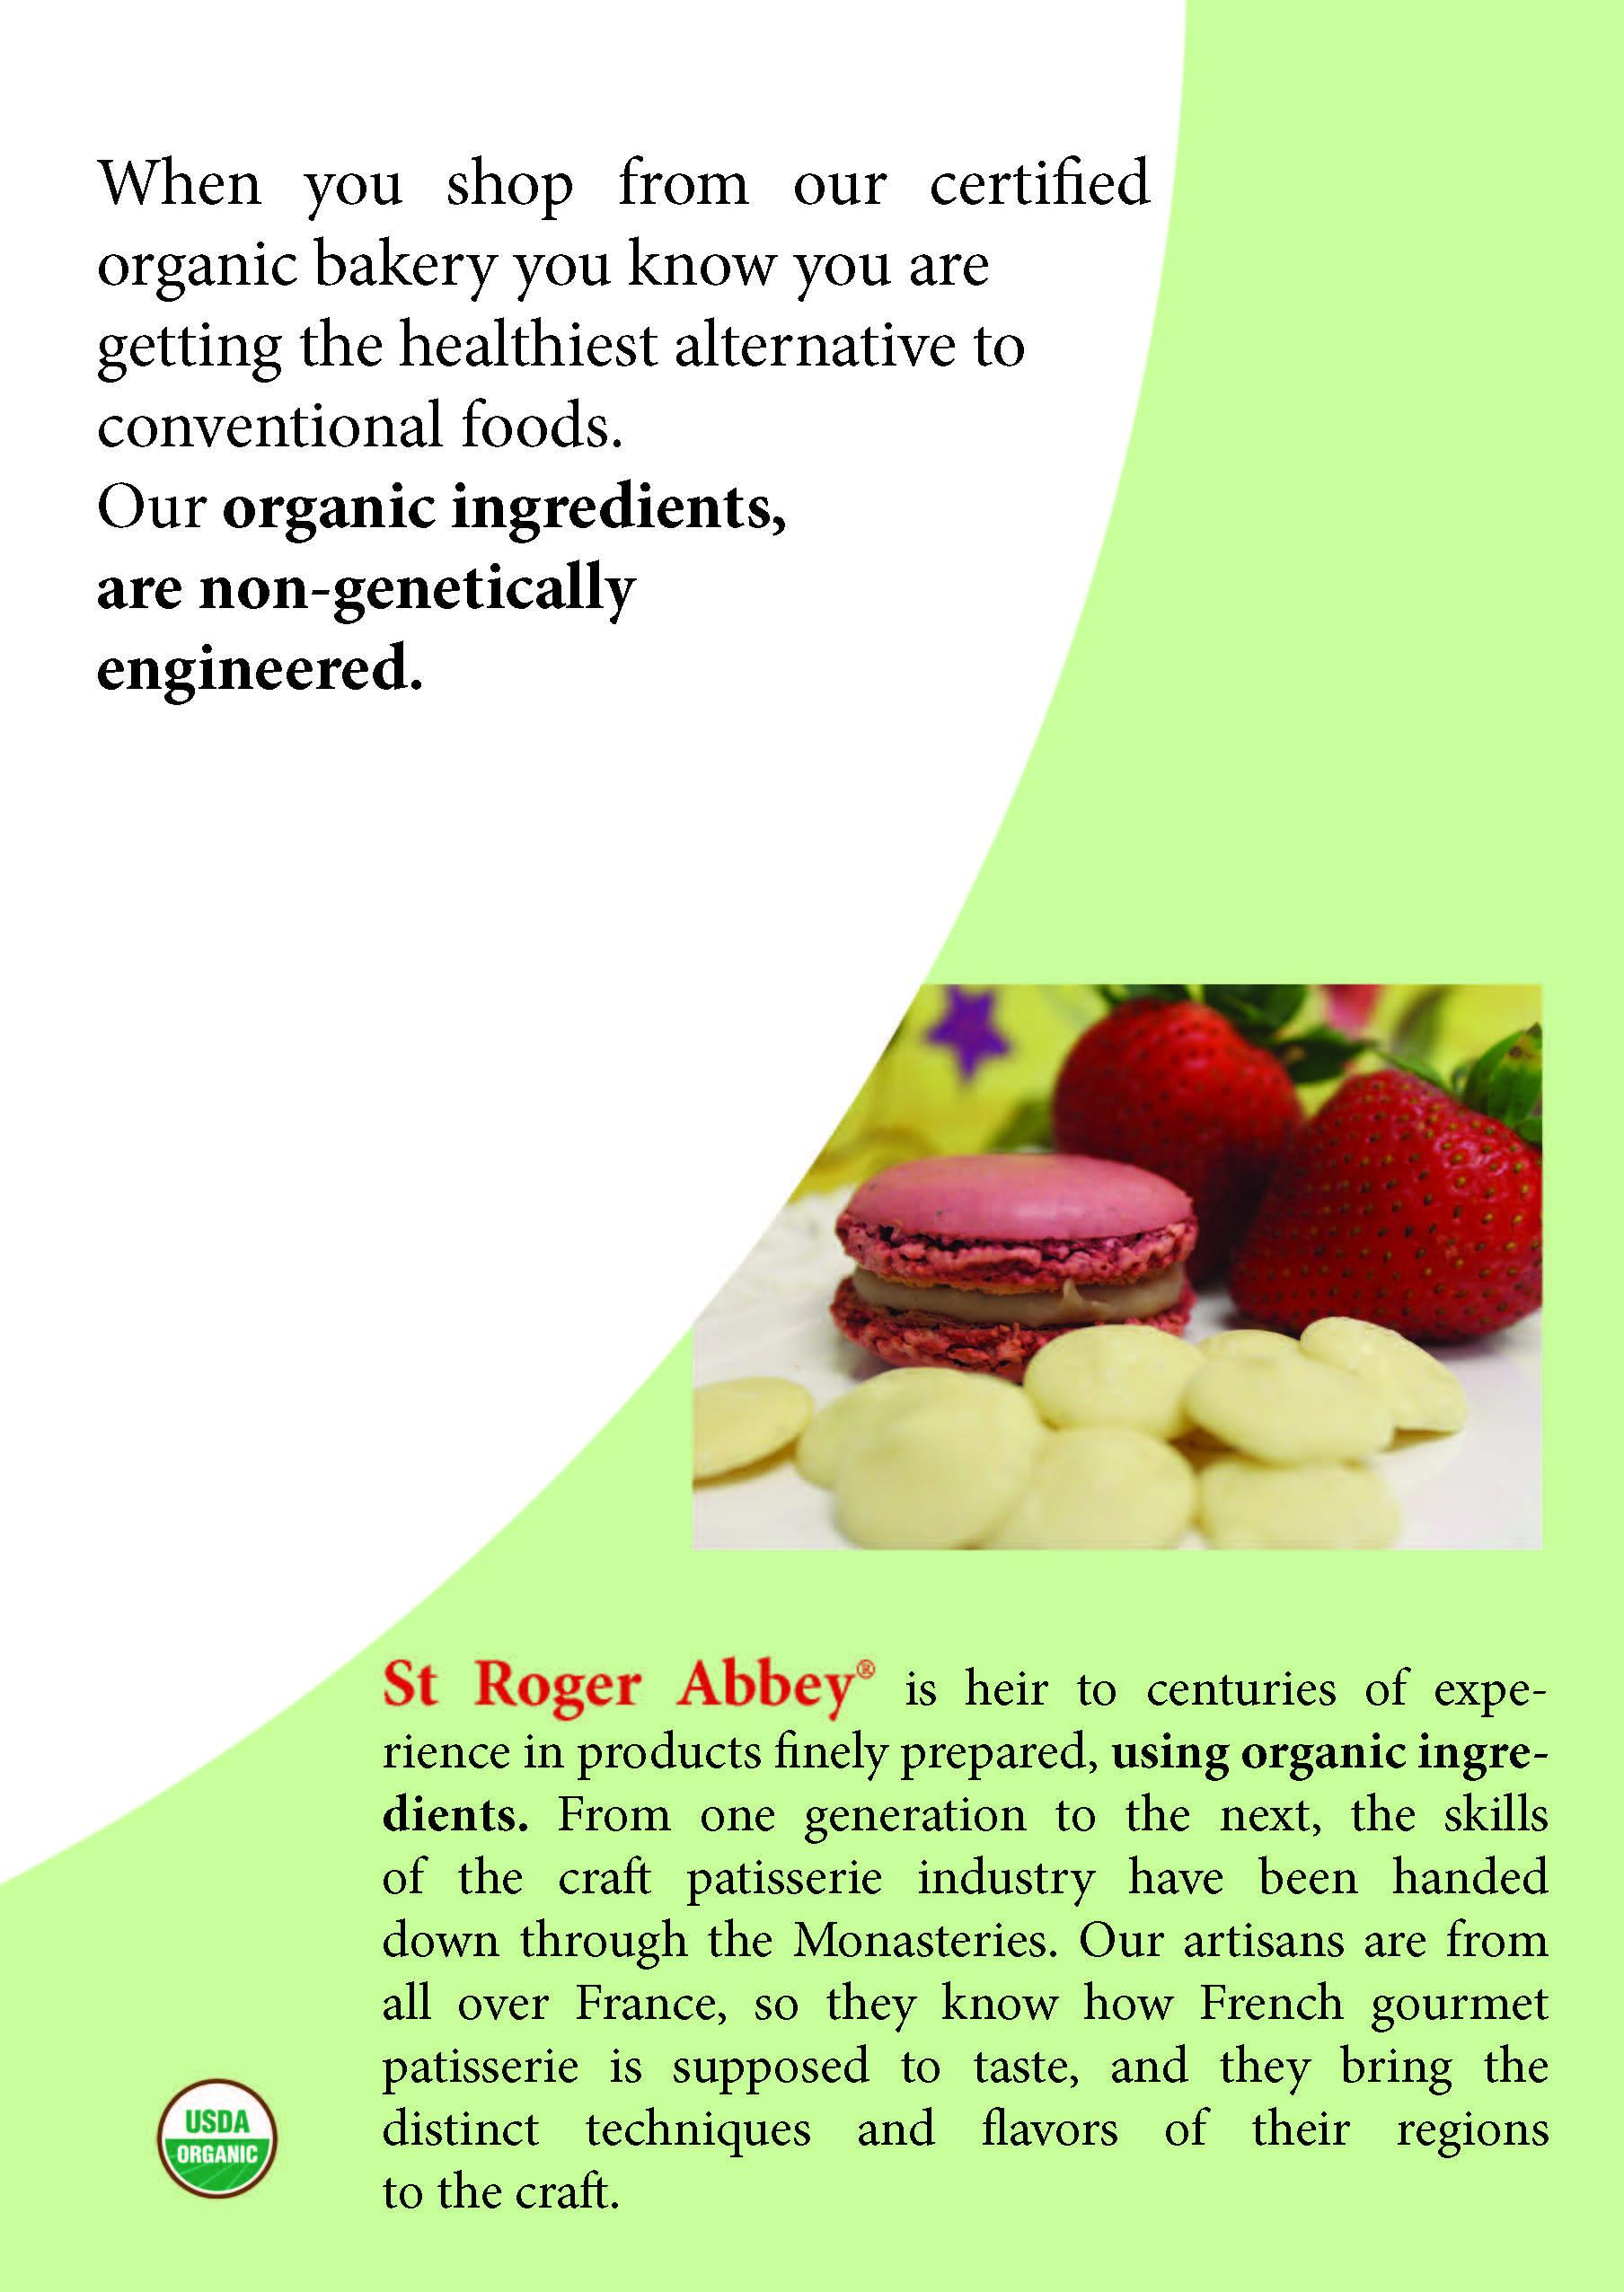 livret-organic-page-03.jpg